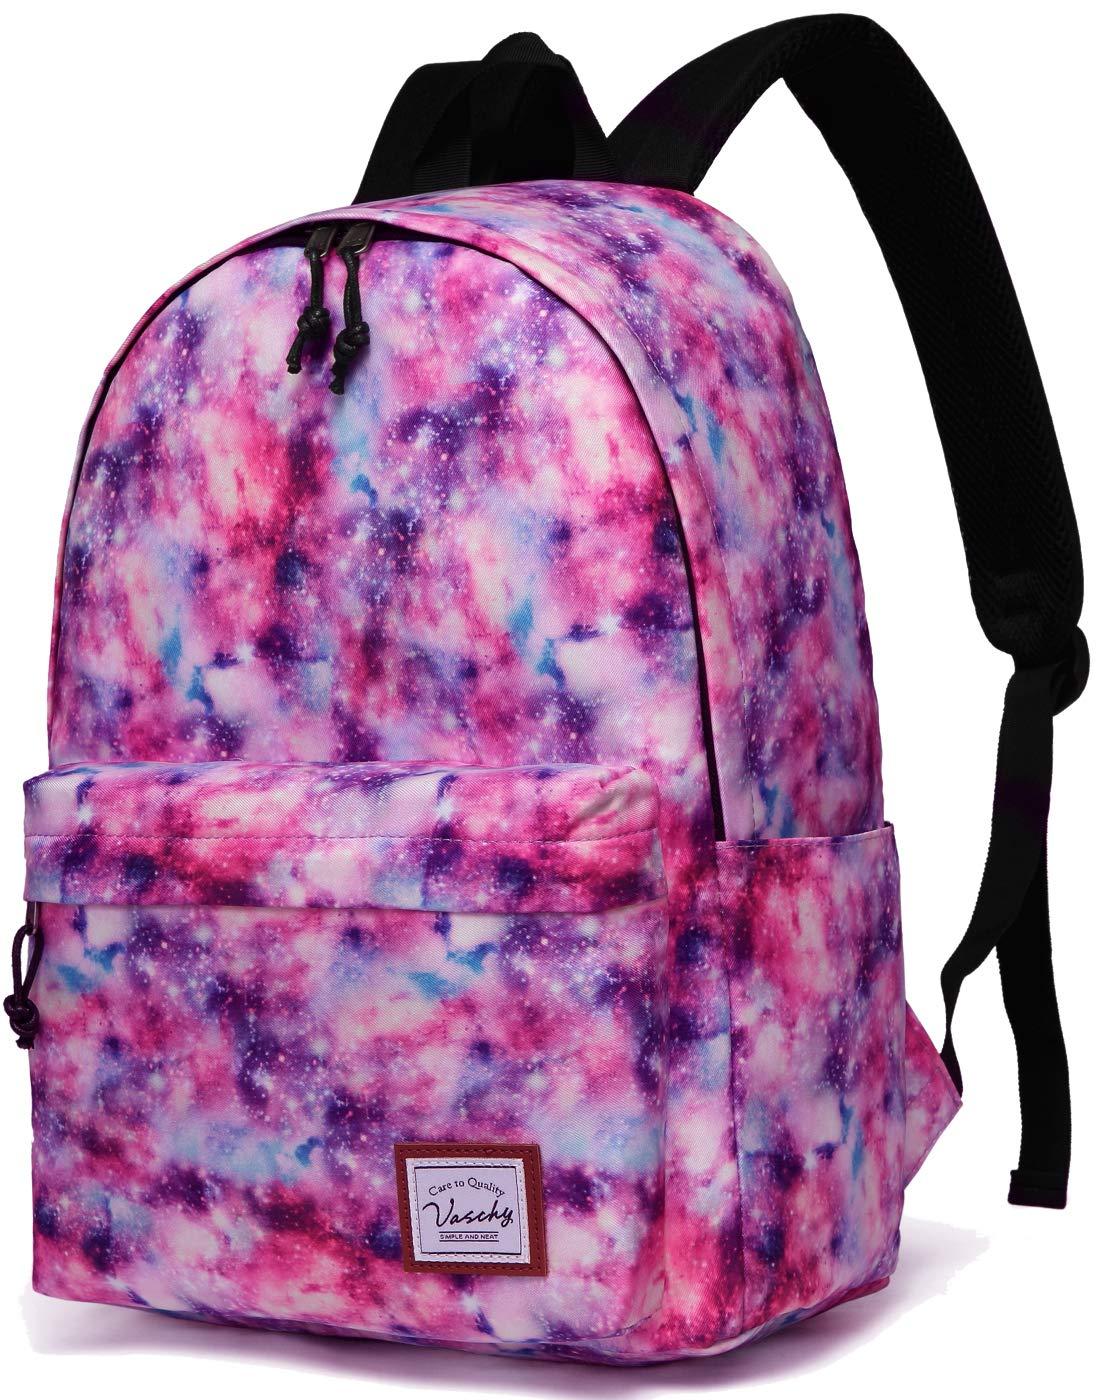 Best Rated in Kids  Backpacks   Helpful Customer Reviews - Amazon.com 6211ca693afcb